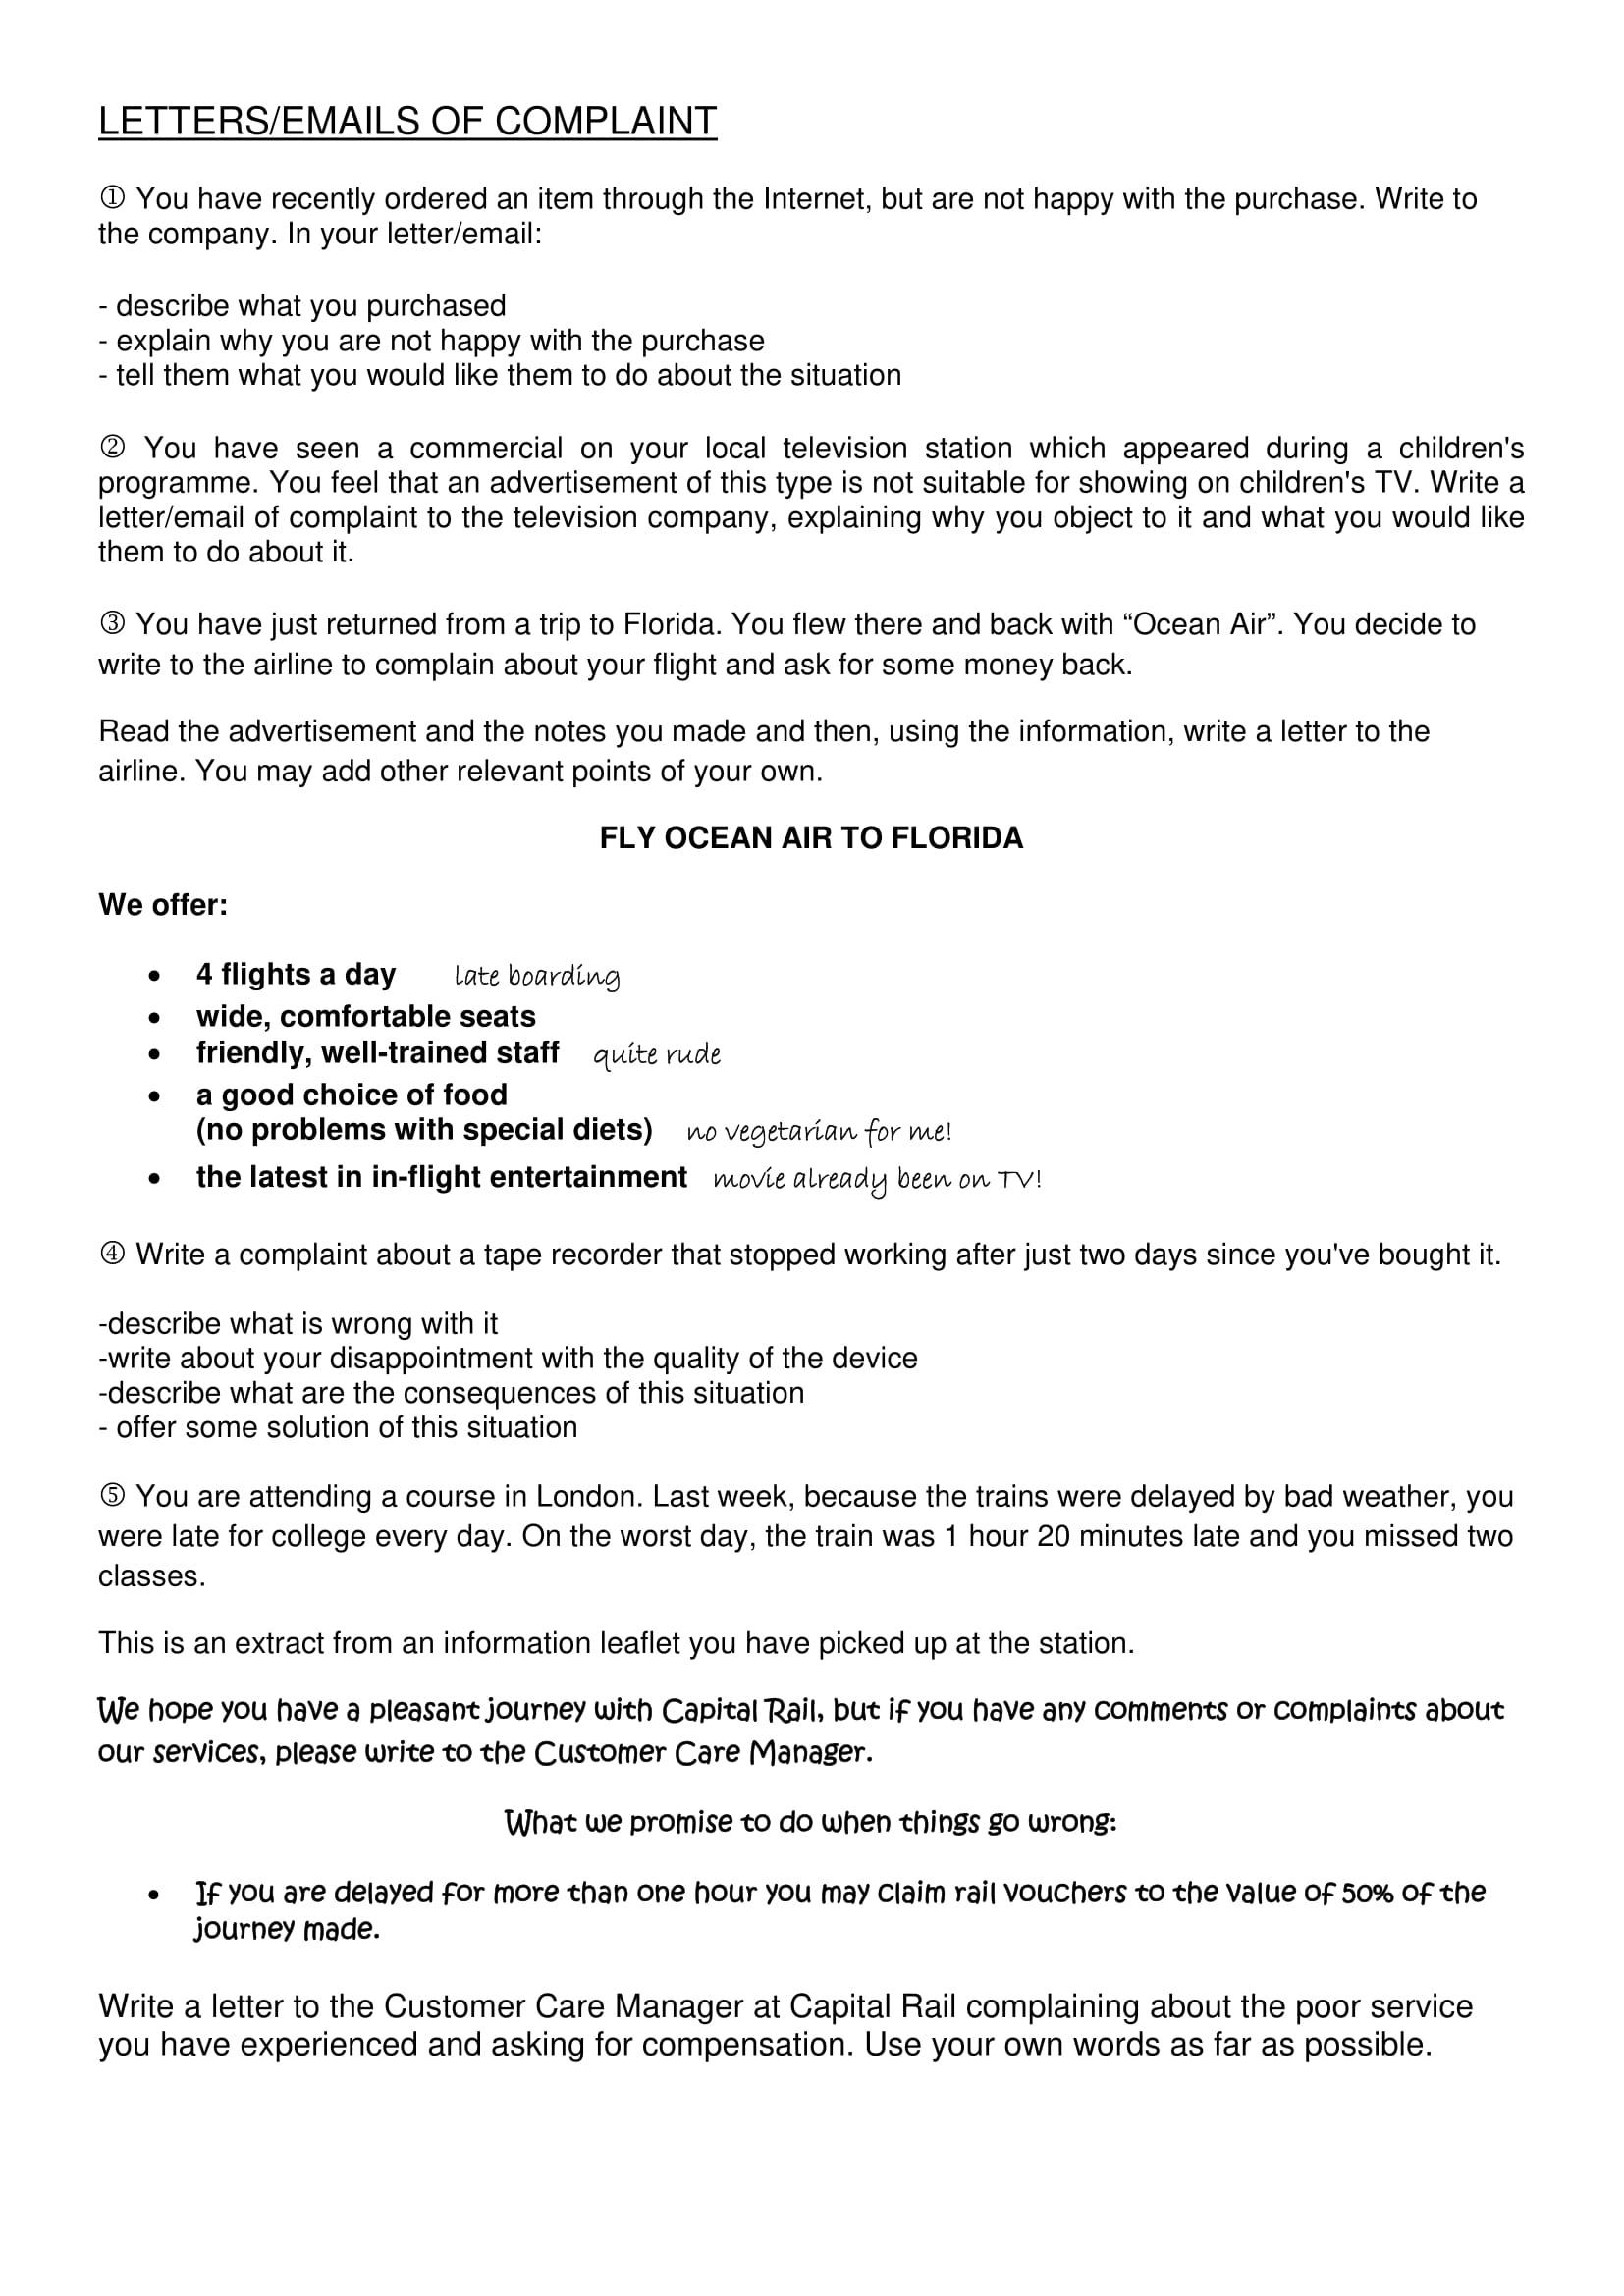 19 complaint letter examples pdf letters eoiaviles spiritdancerdesigns Choice Image